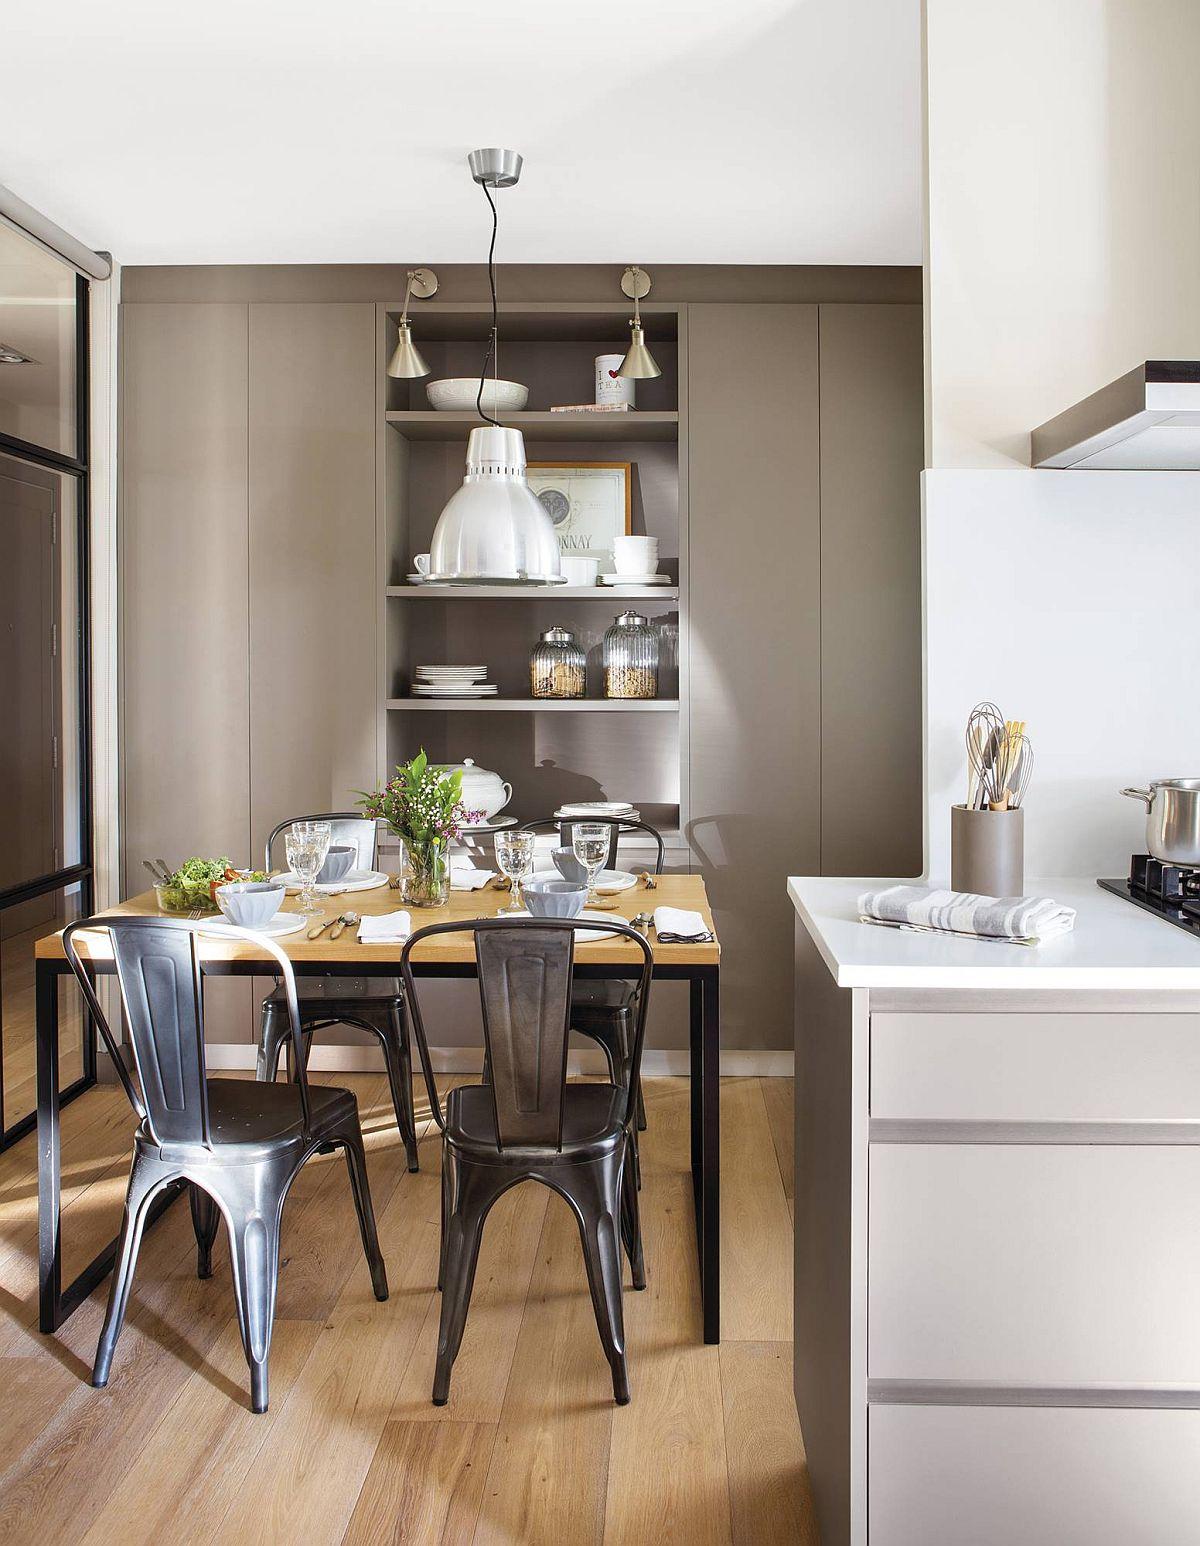 adelaparvu.com despre apartament amenajat in tonuri de bej, design Chari Manzano si Marta Herrera, Foto Pepa Oromi (1)